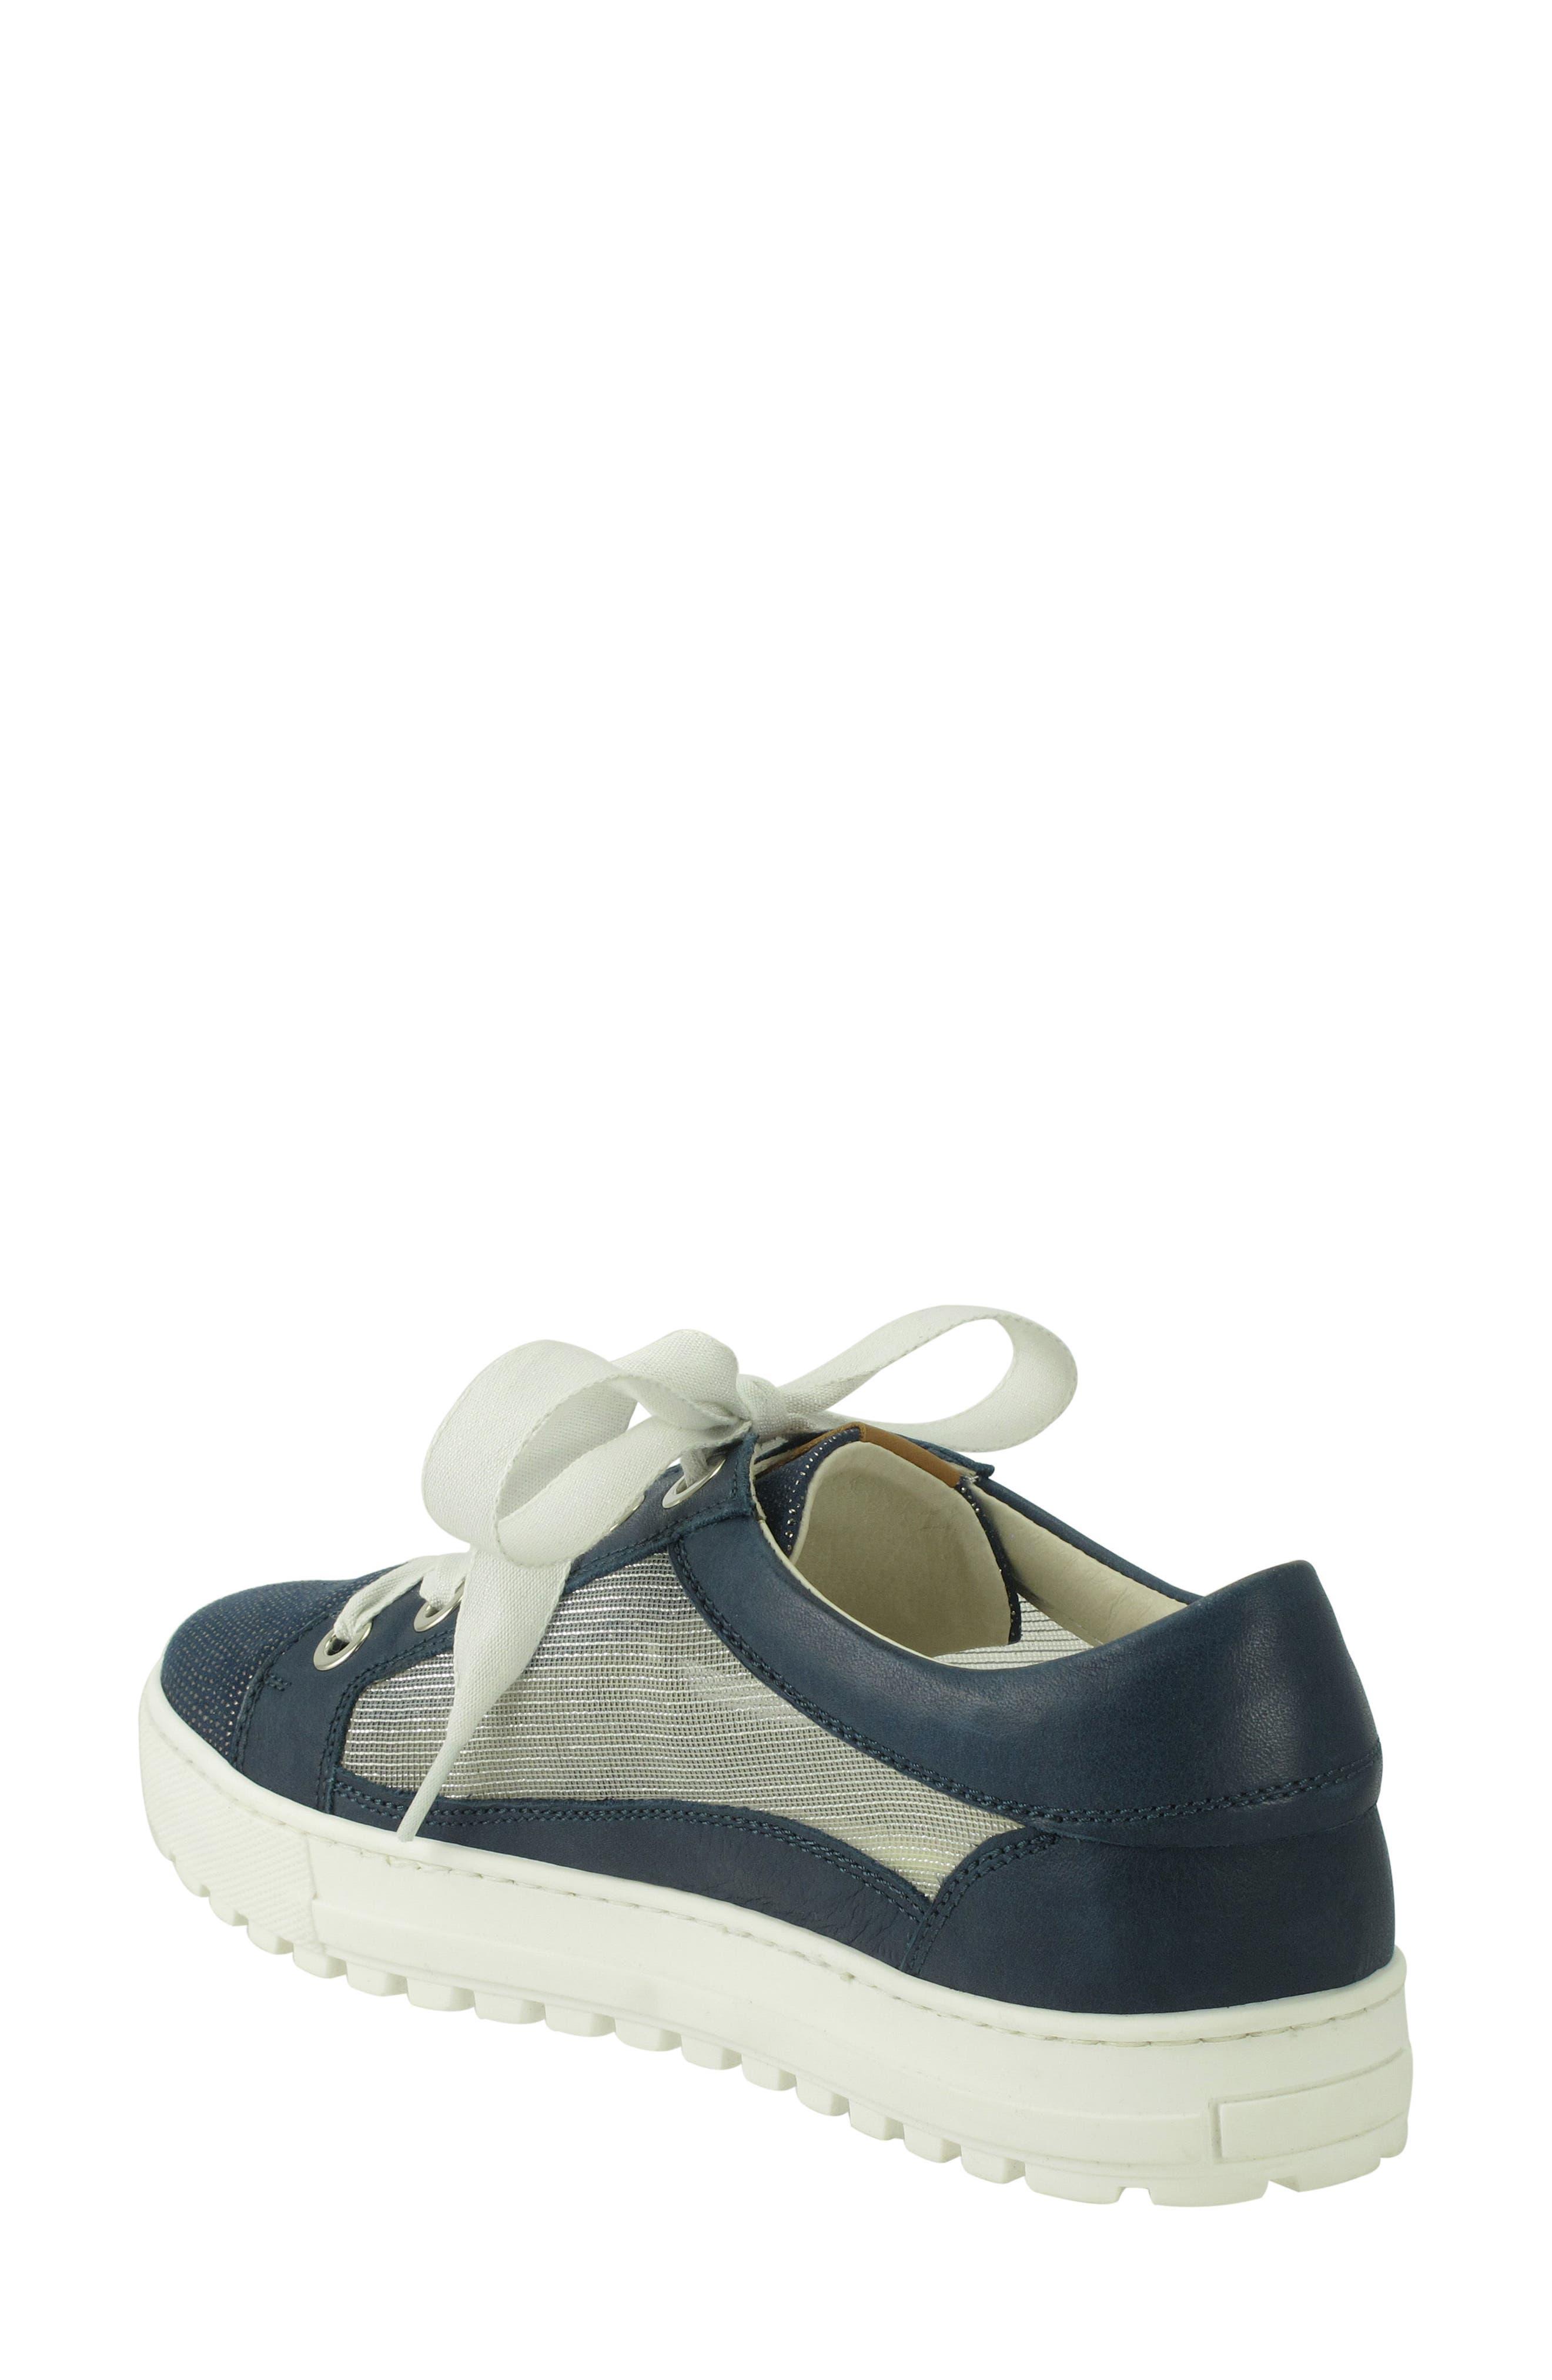 Layton Sneaker,                             Alternate thumbnail 2, color,                             Jeans Leather